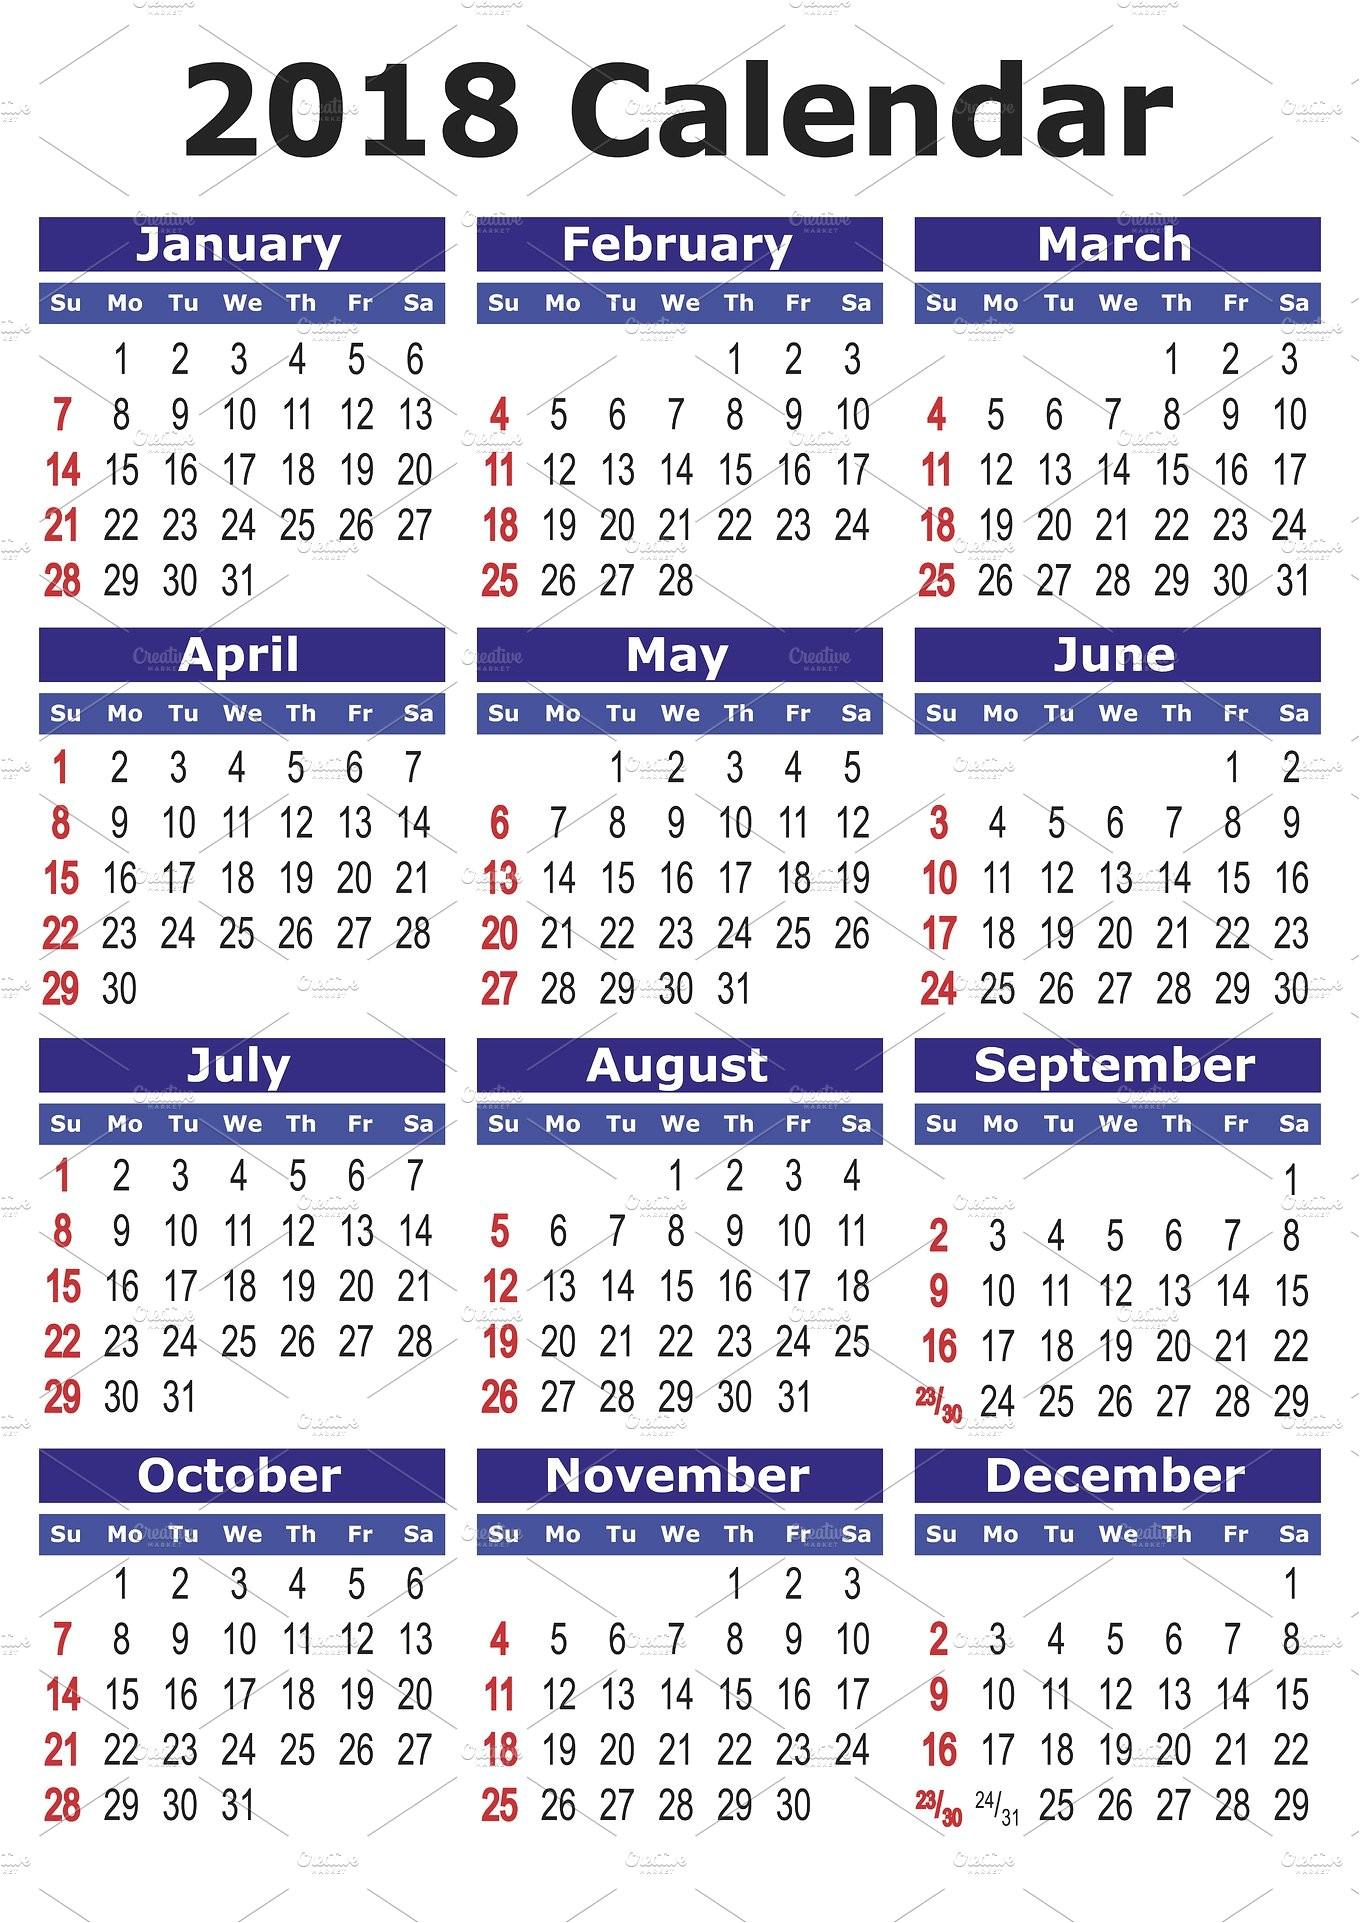 1257931 2018 calendar in english